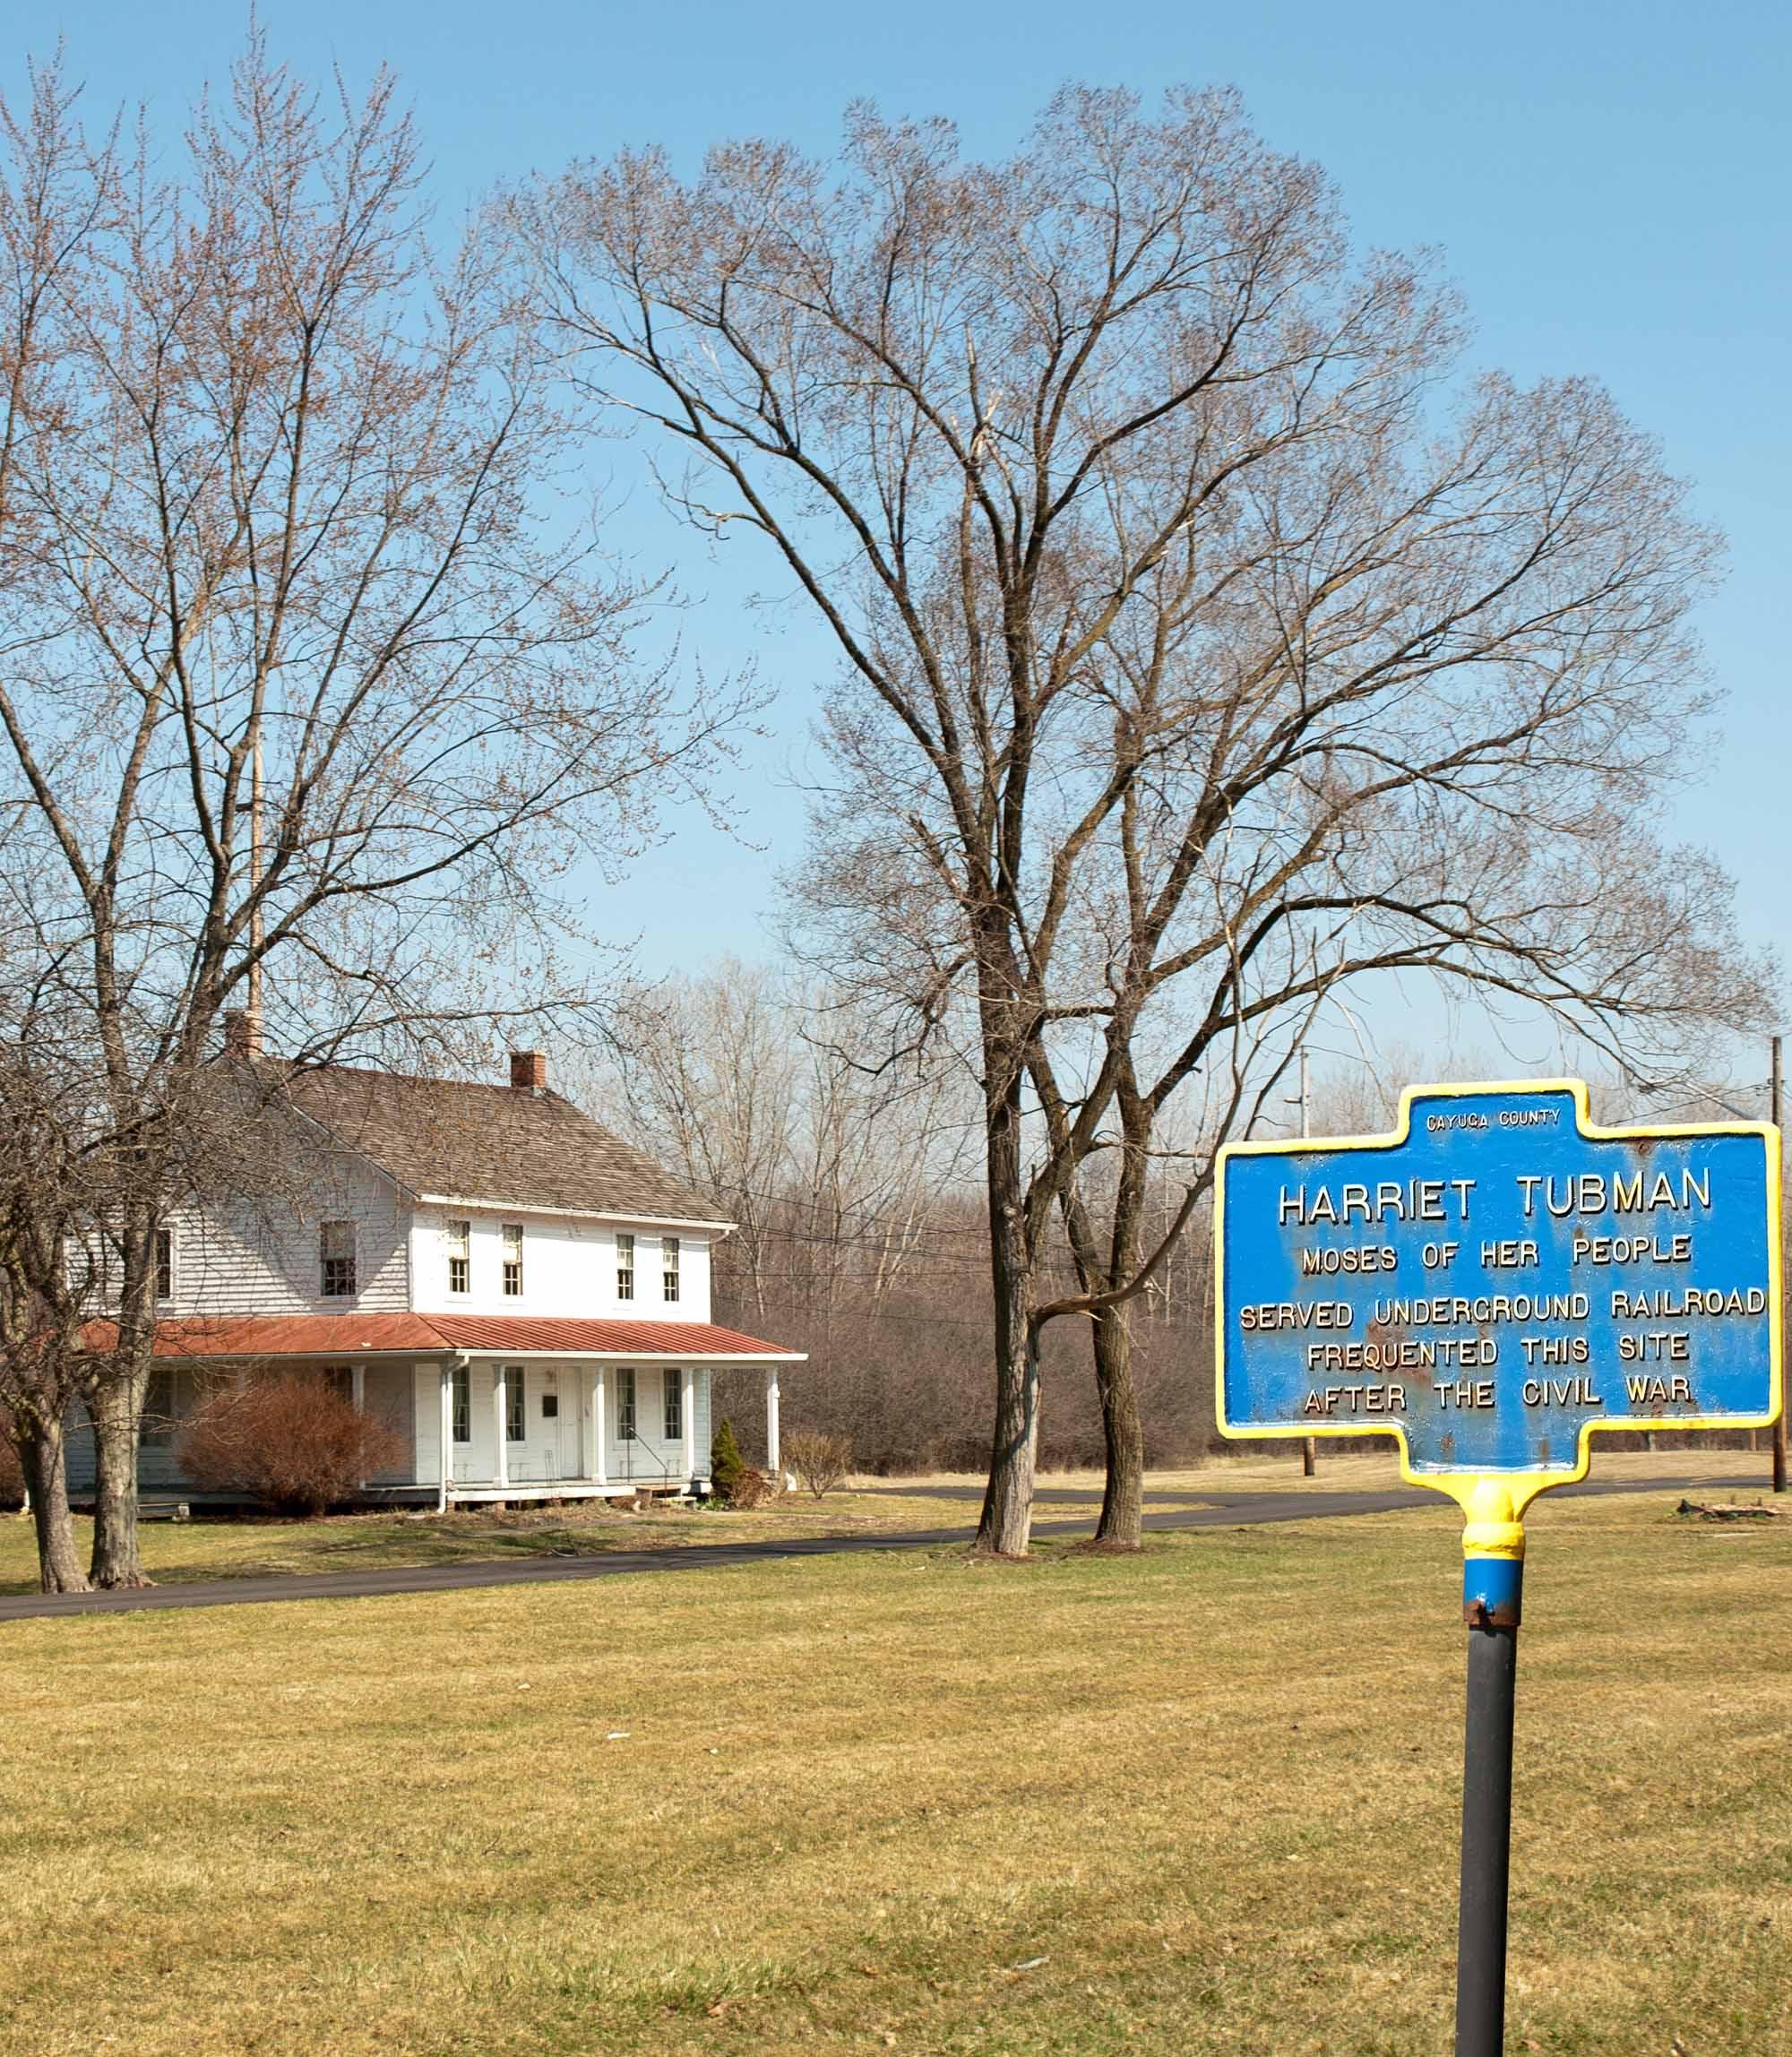 New York Home of Harriet Tubman